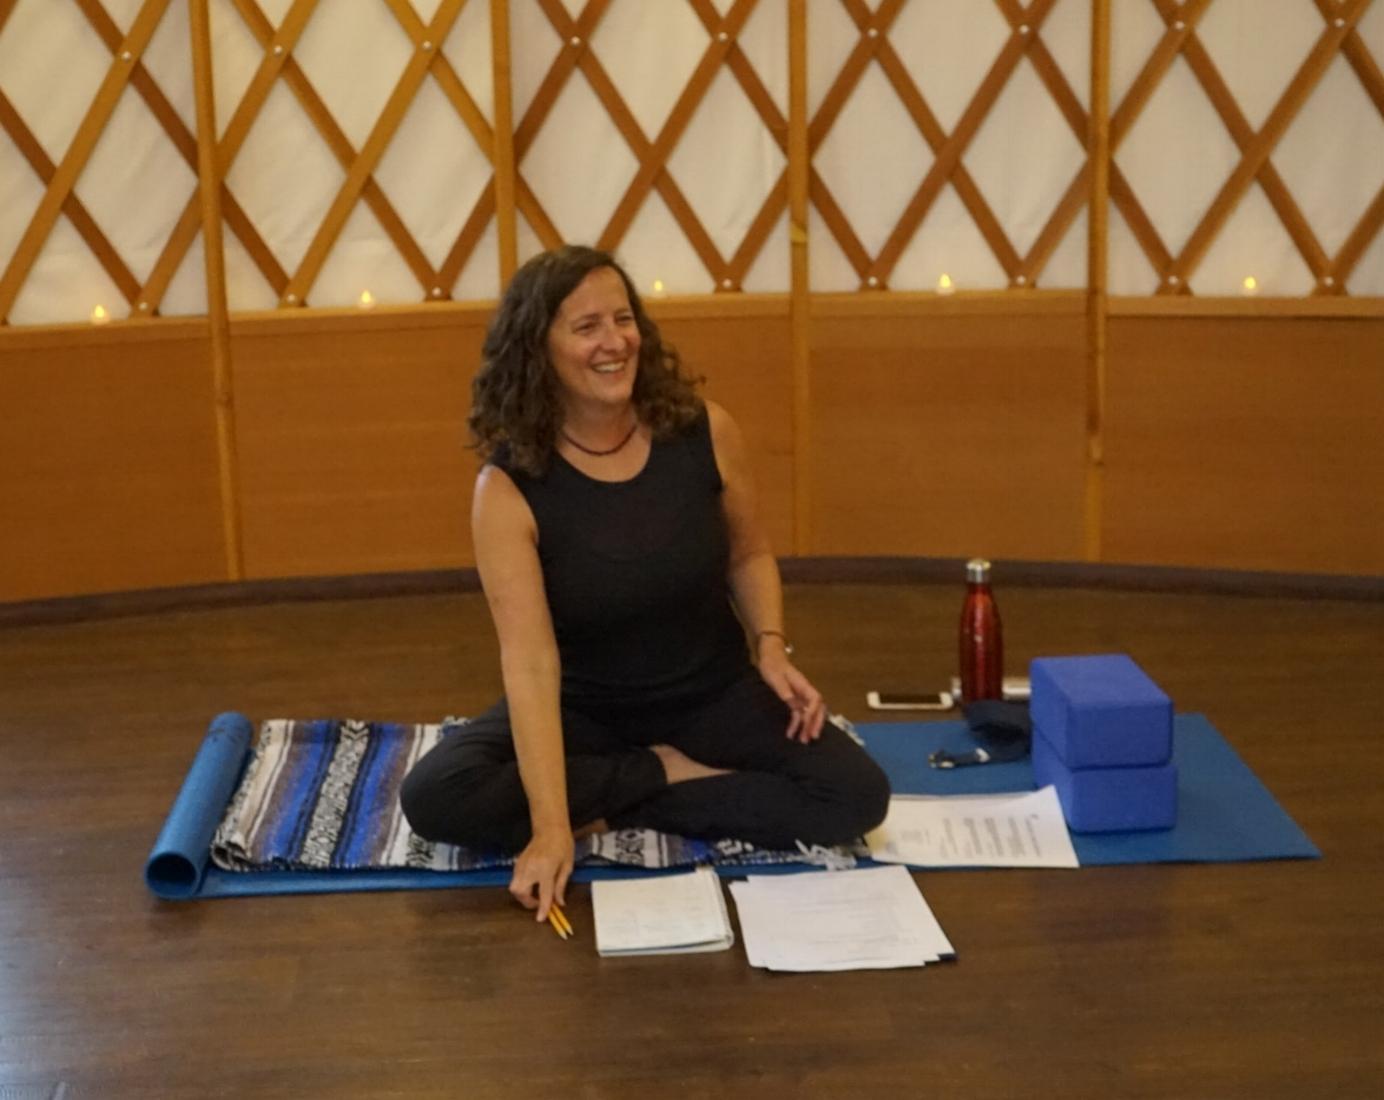 Yoga for Elul at UA - Julie sitting.jpg